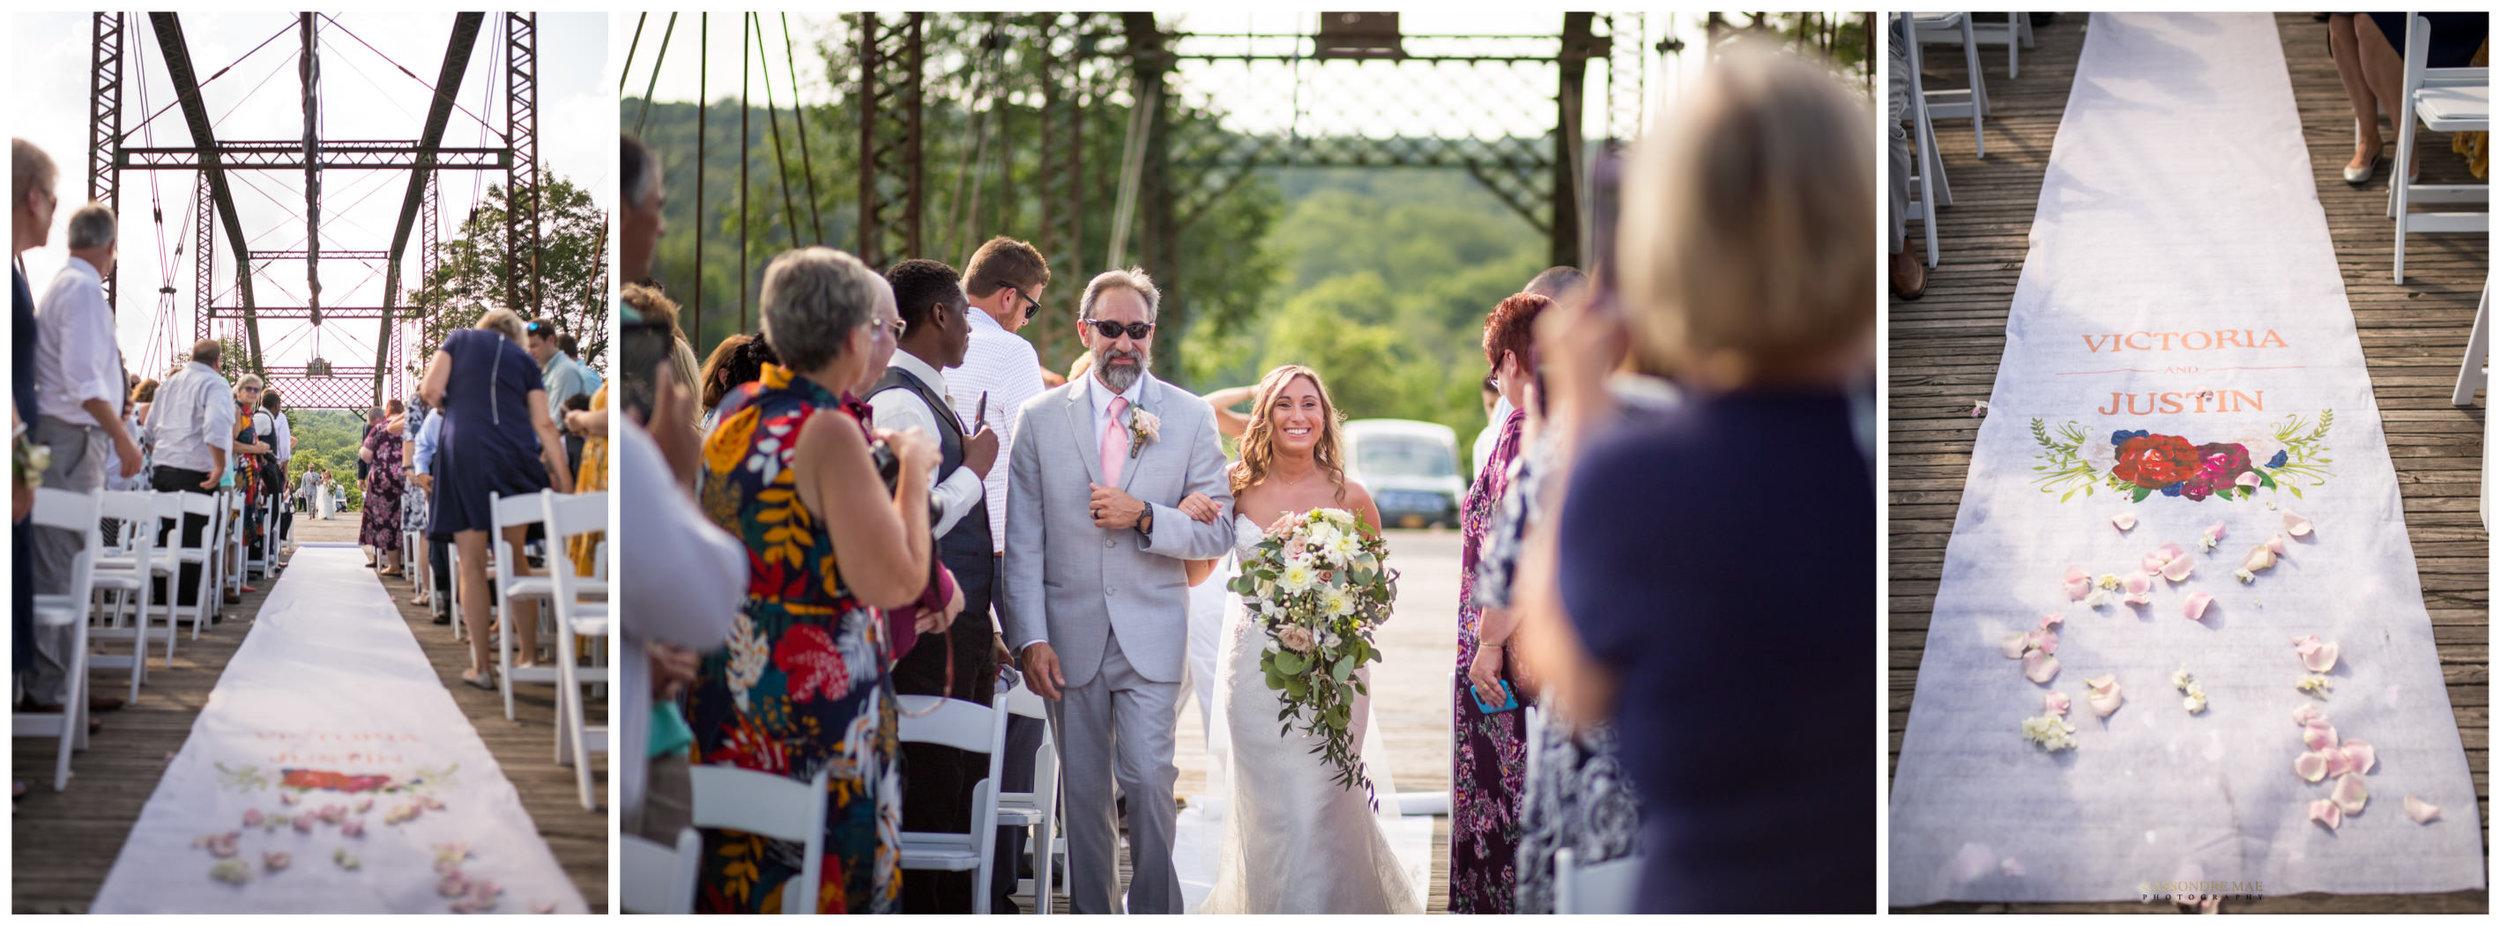 Cassondre Mae Photography Hudson Valley Wedding 12.jpg